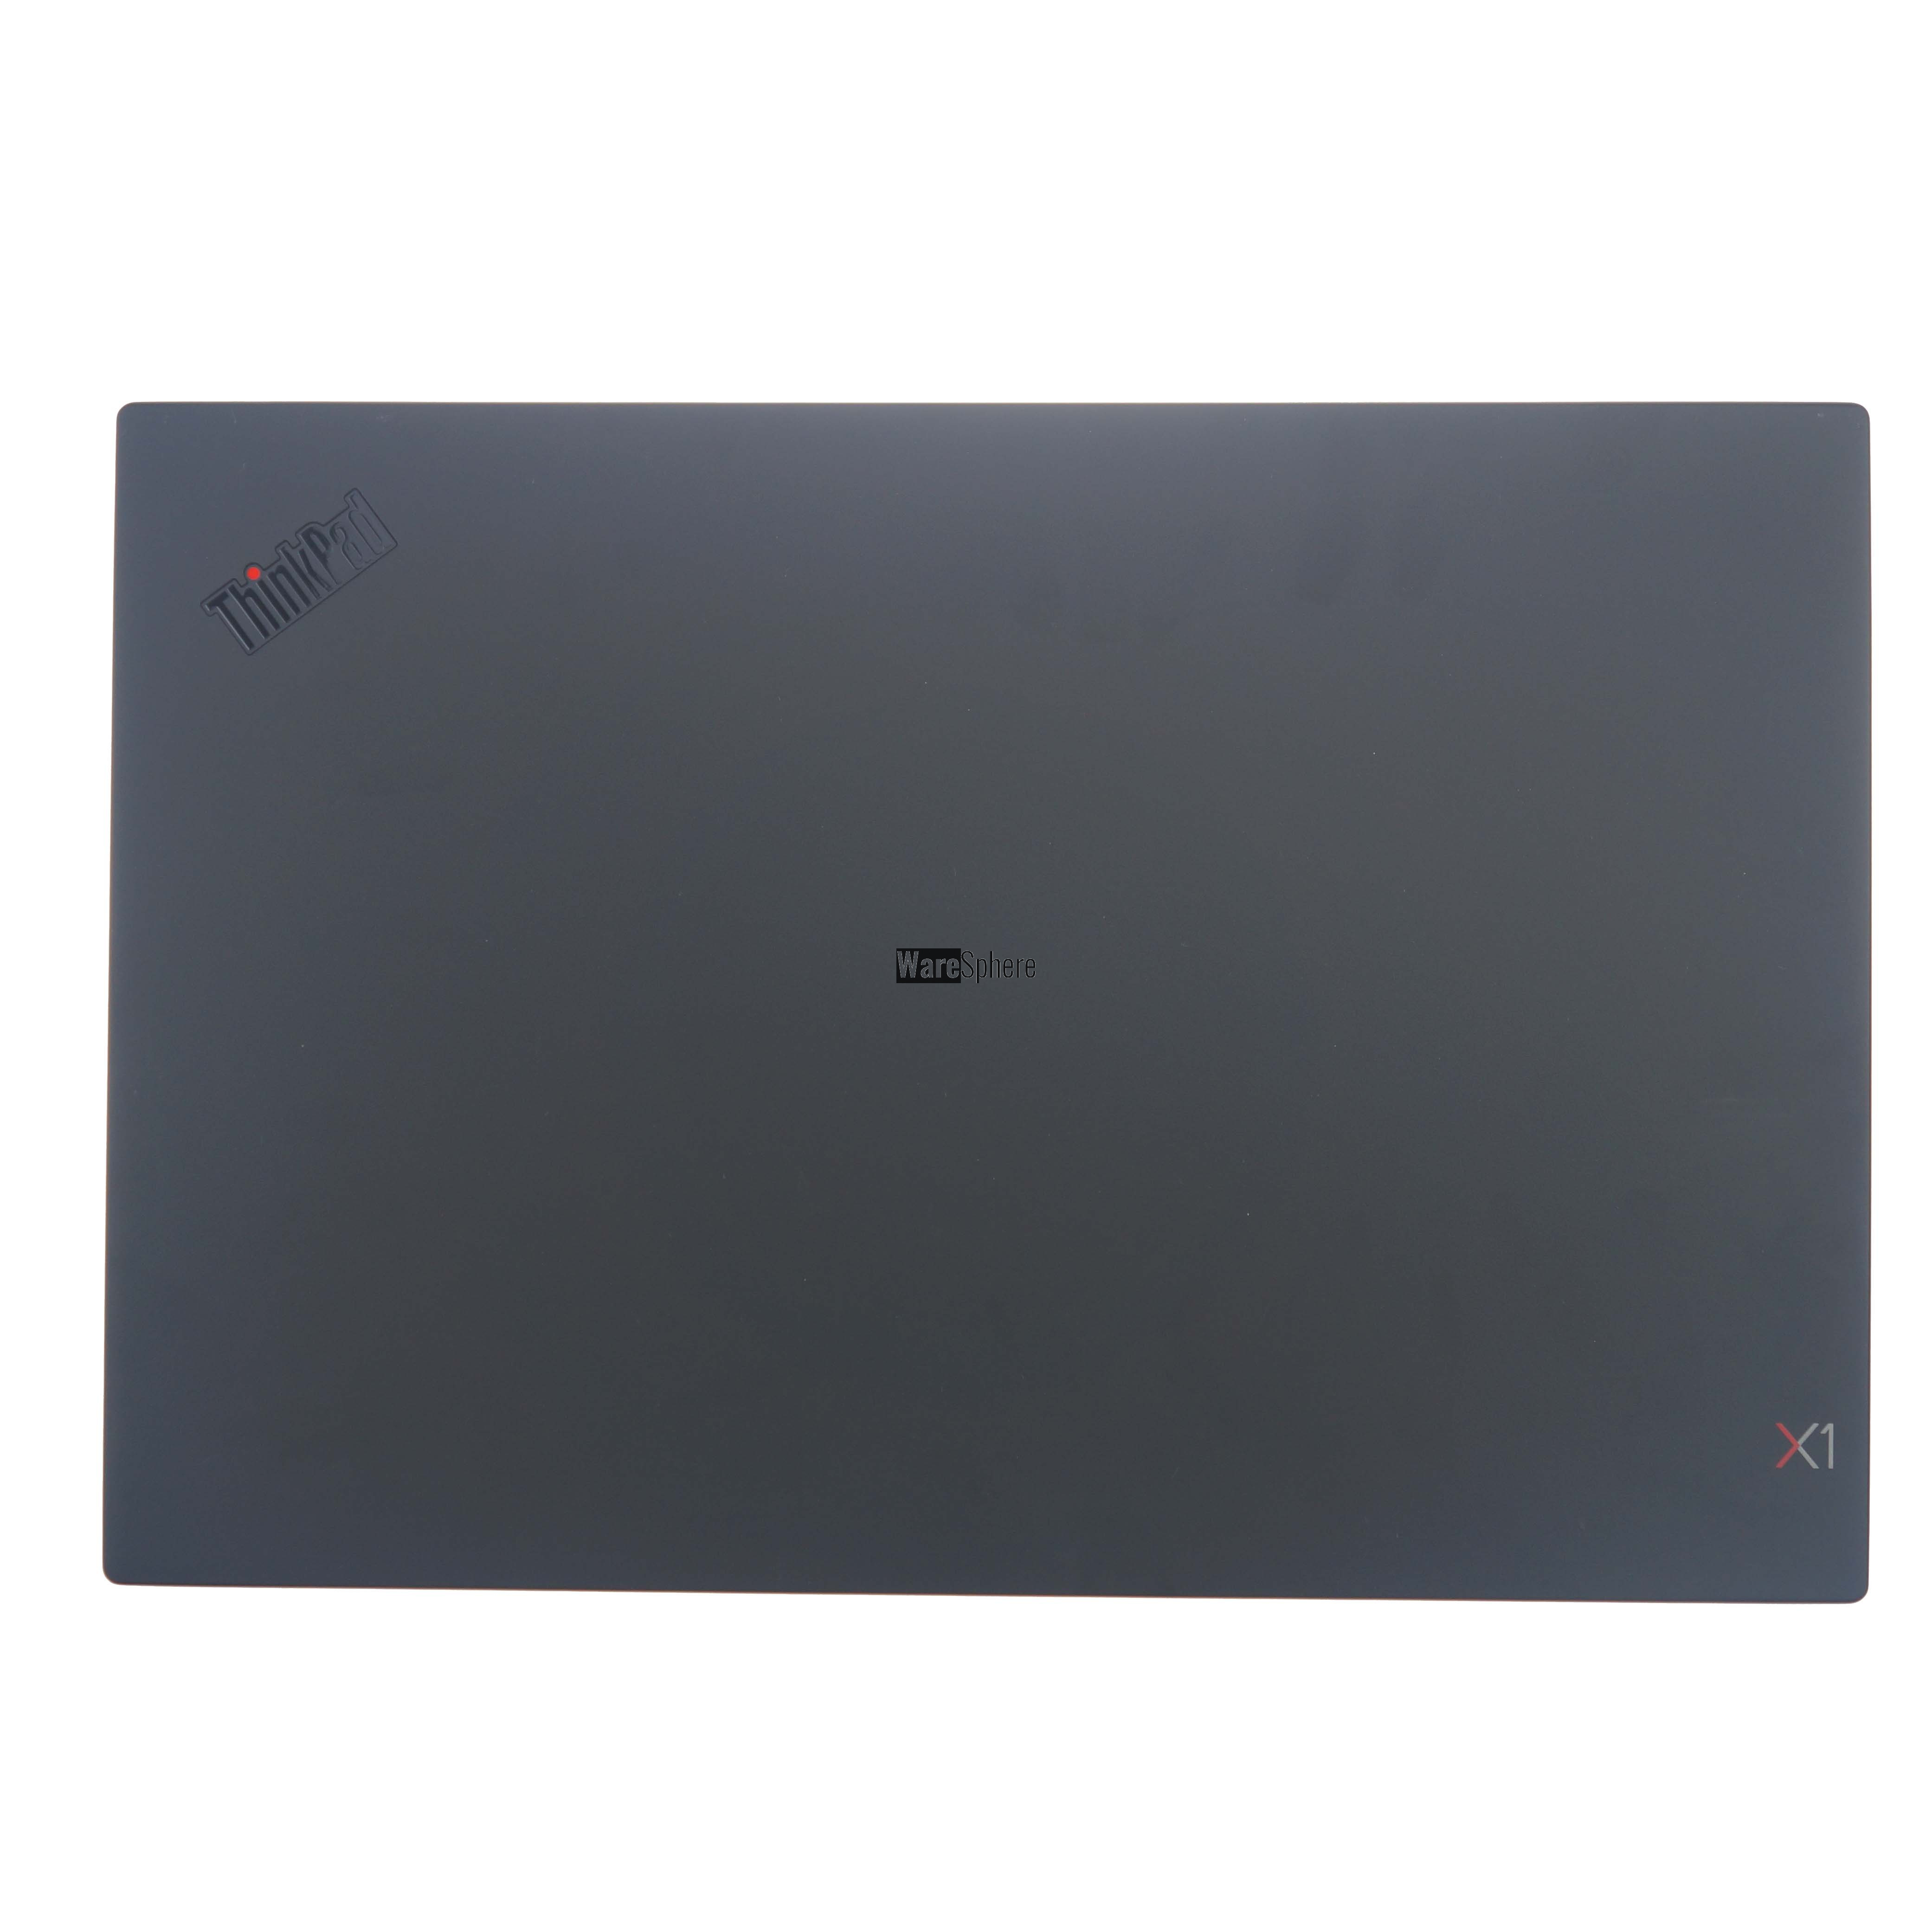 LCD Back Cover for Lenovo ThinkPad x1 extreme 2st Gen 02XR063 4600GU000001 Black